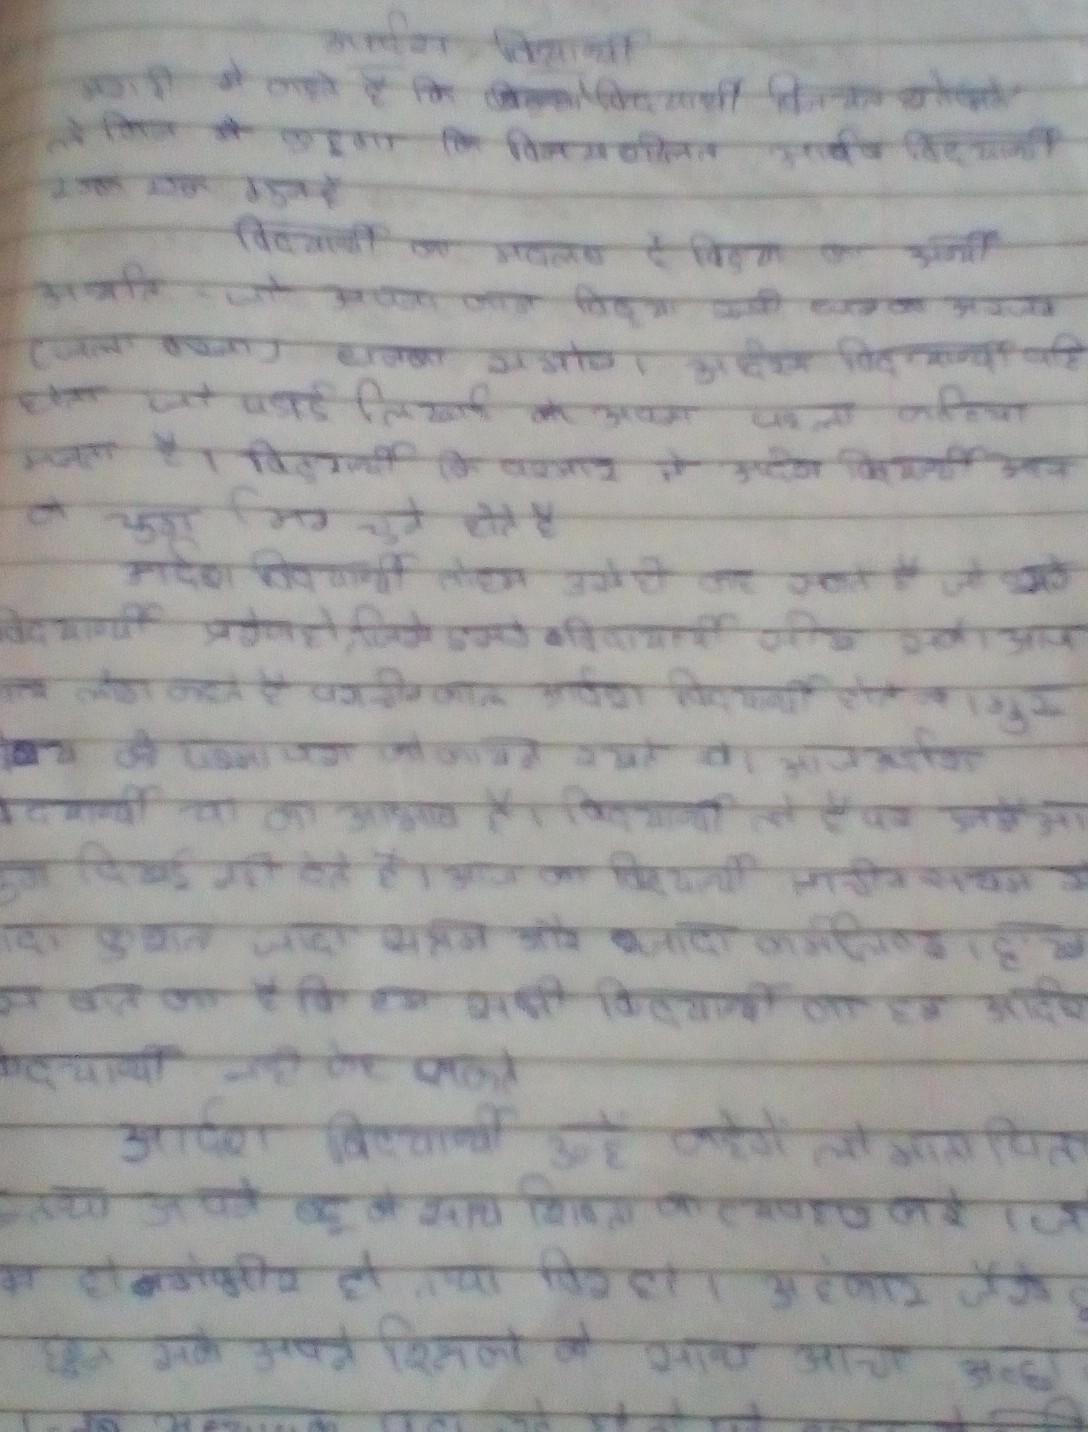 essay on adarsh vidyarthi